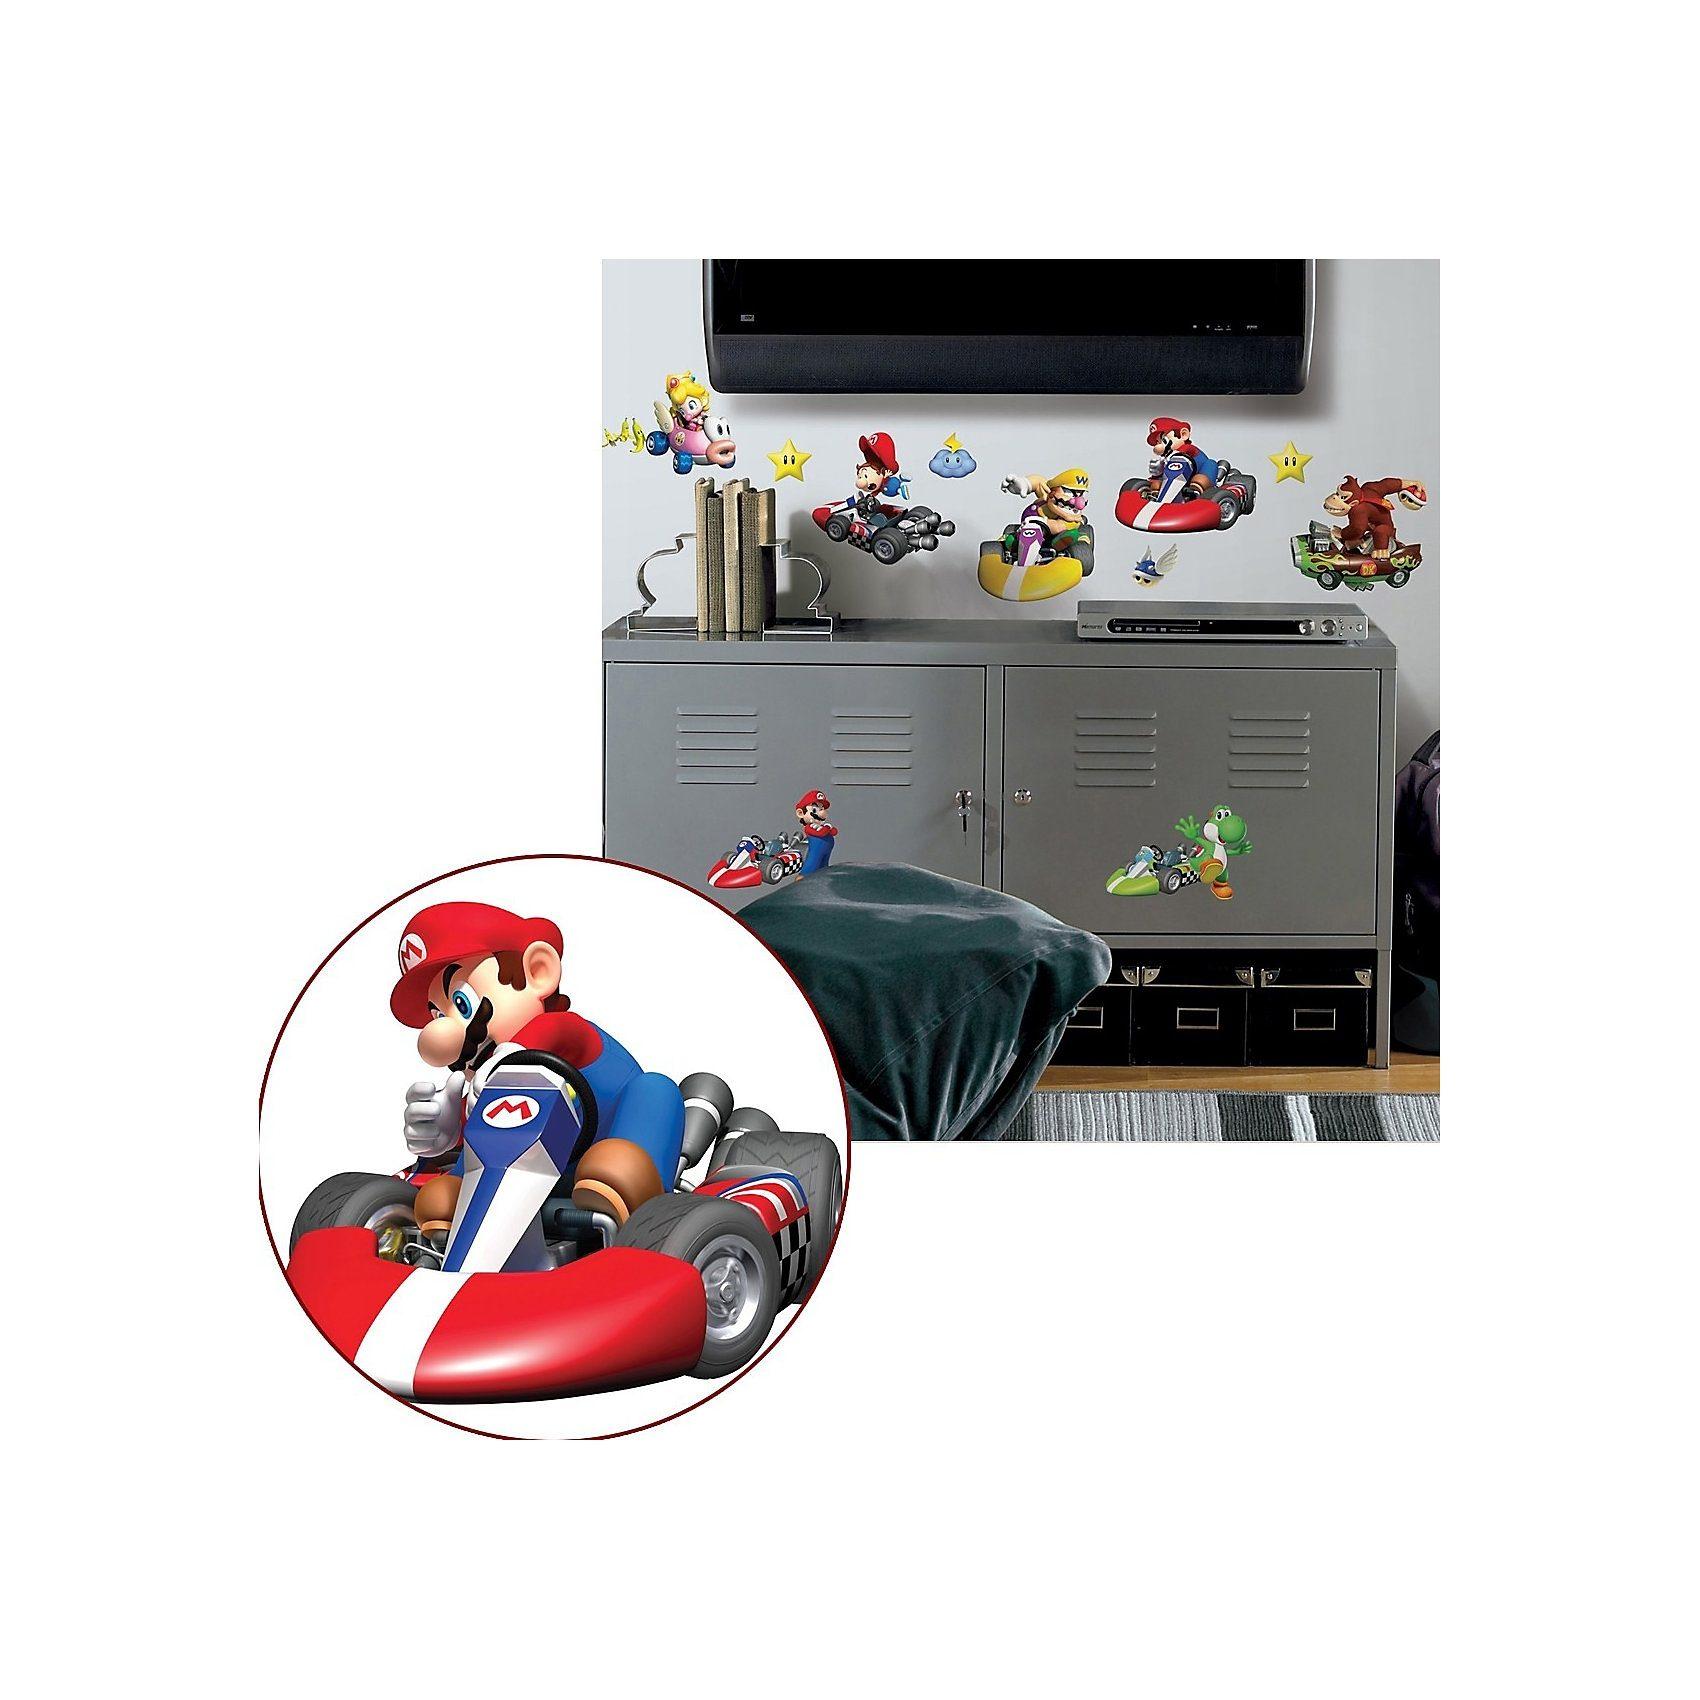 RoomMates Wandsticker Nintendo Mario Kart Wii, 35-tlg.